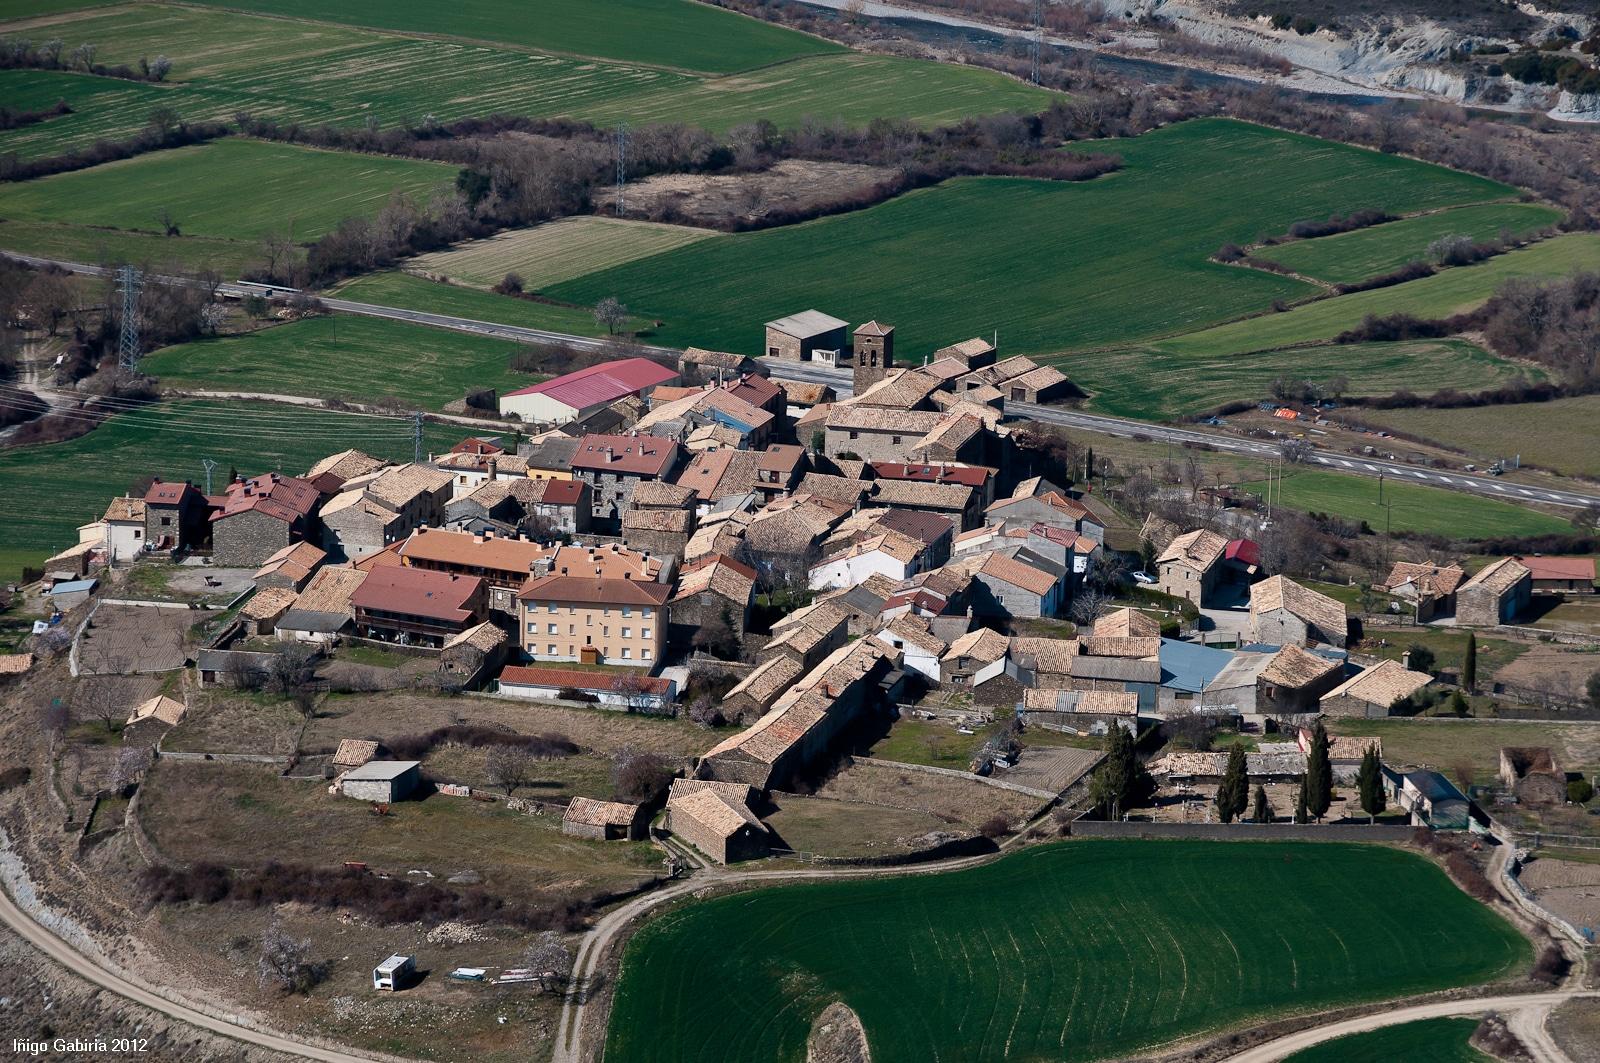 Vista aérea de Javierregay, Jaca